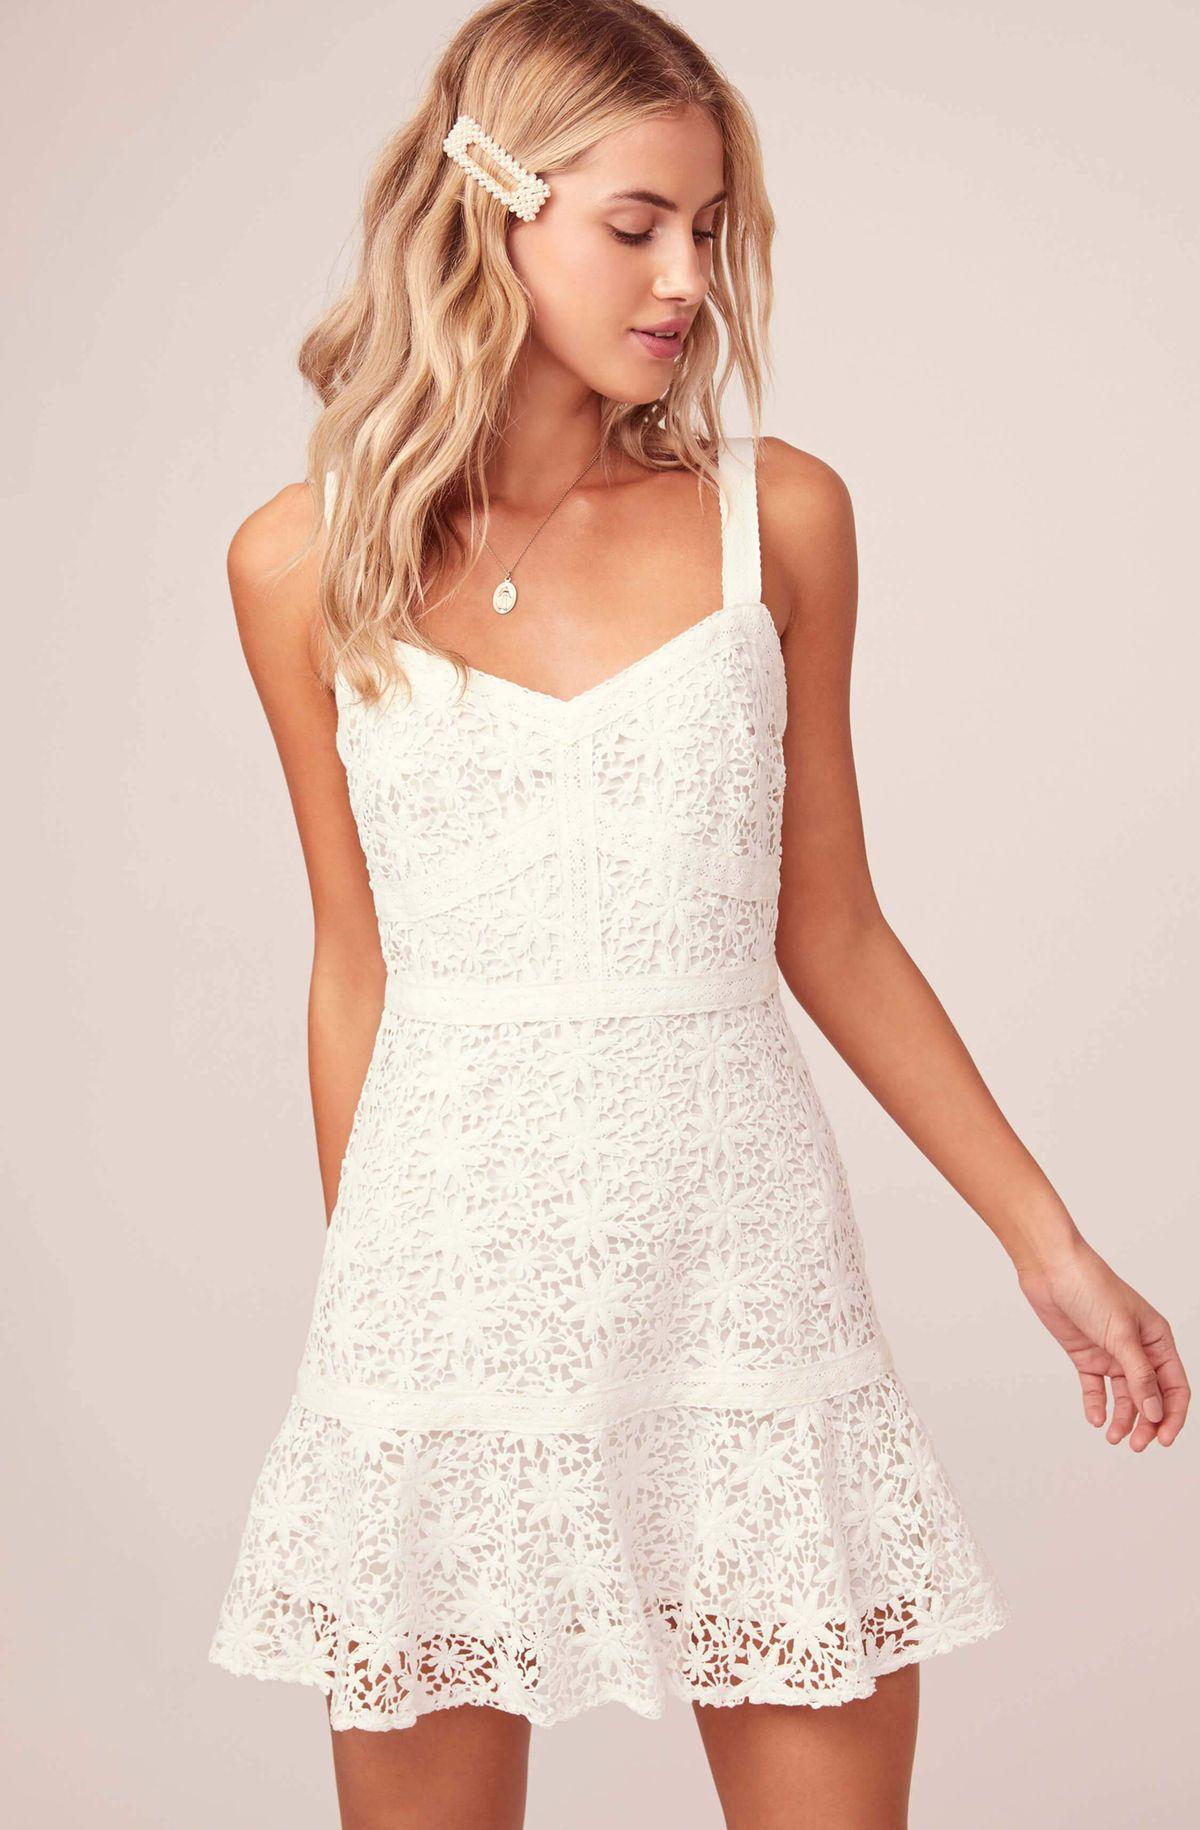 Ti1619586066tl4e9cec1f583056459111d63e24f3b8ef In 2021 White Lace Mini Dress White Mini Dress White Dresses Graduation [ 1830 x 1200 Pixel ]